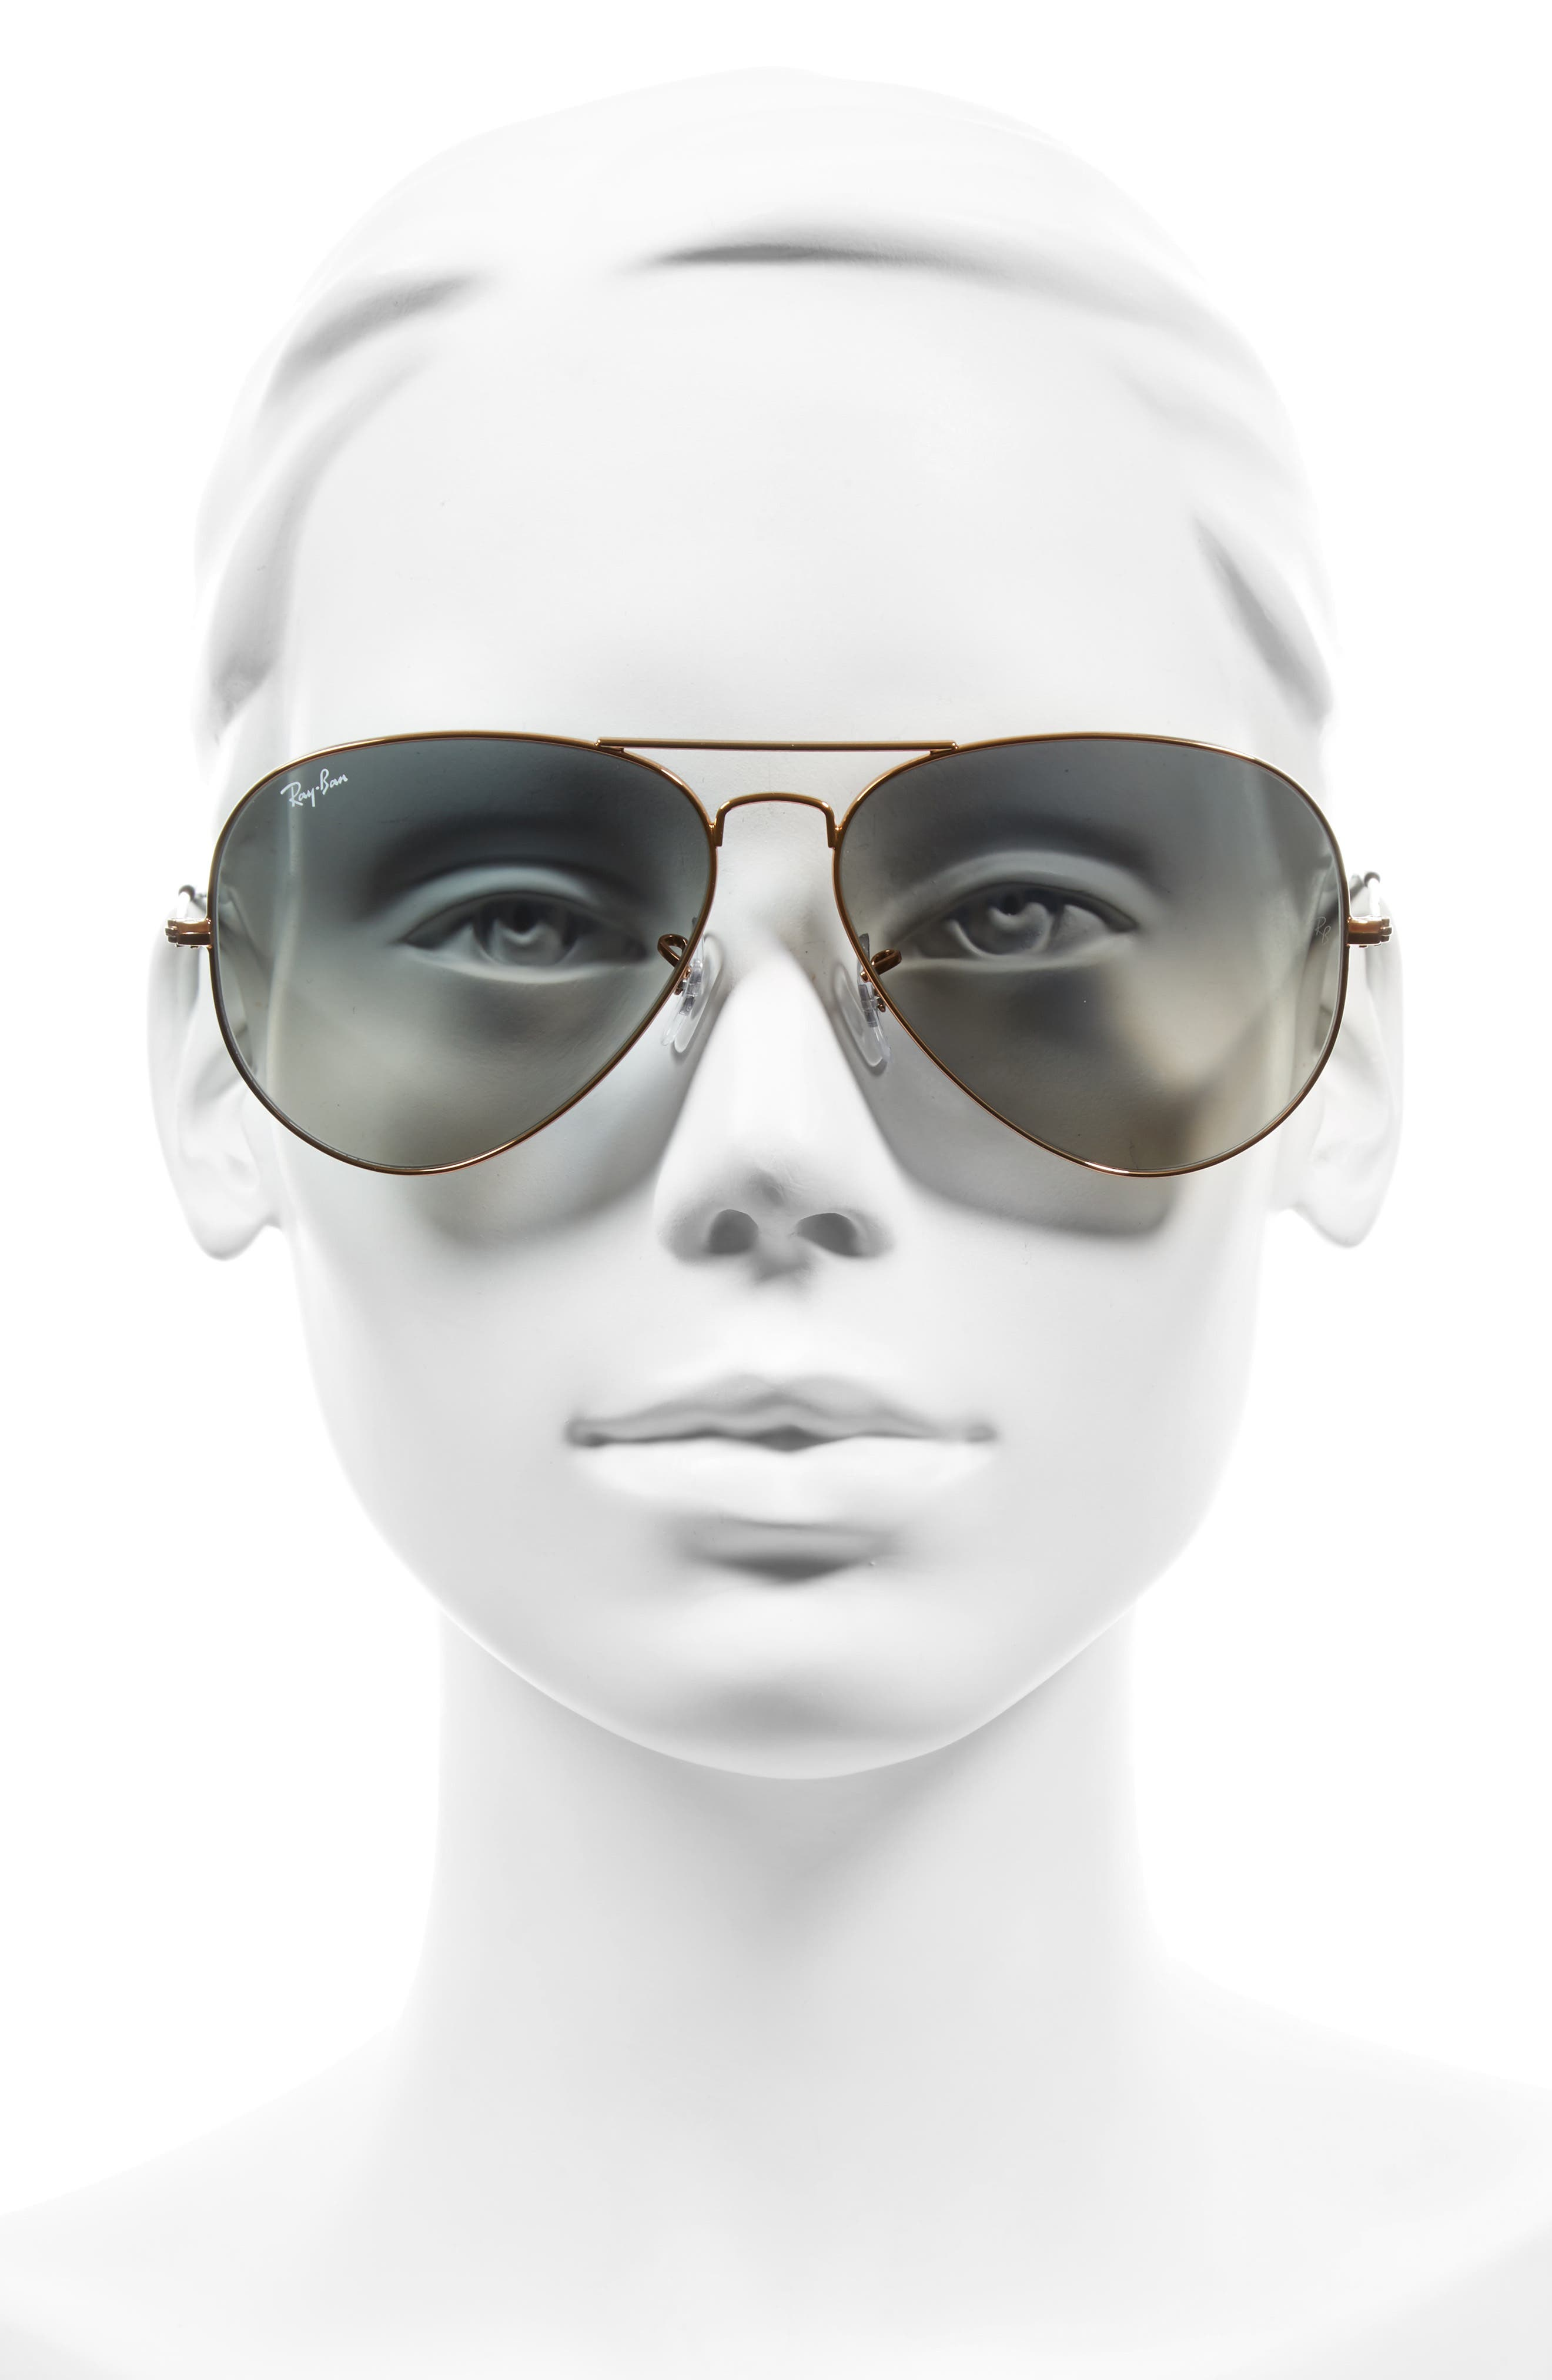 62mm Sunglasses,                             Alternate thumbnail 2, color,